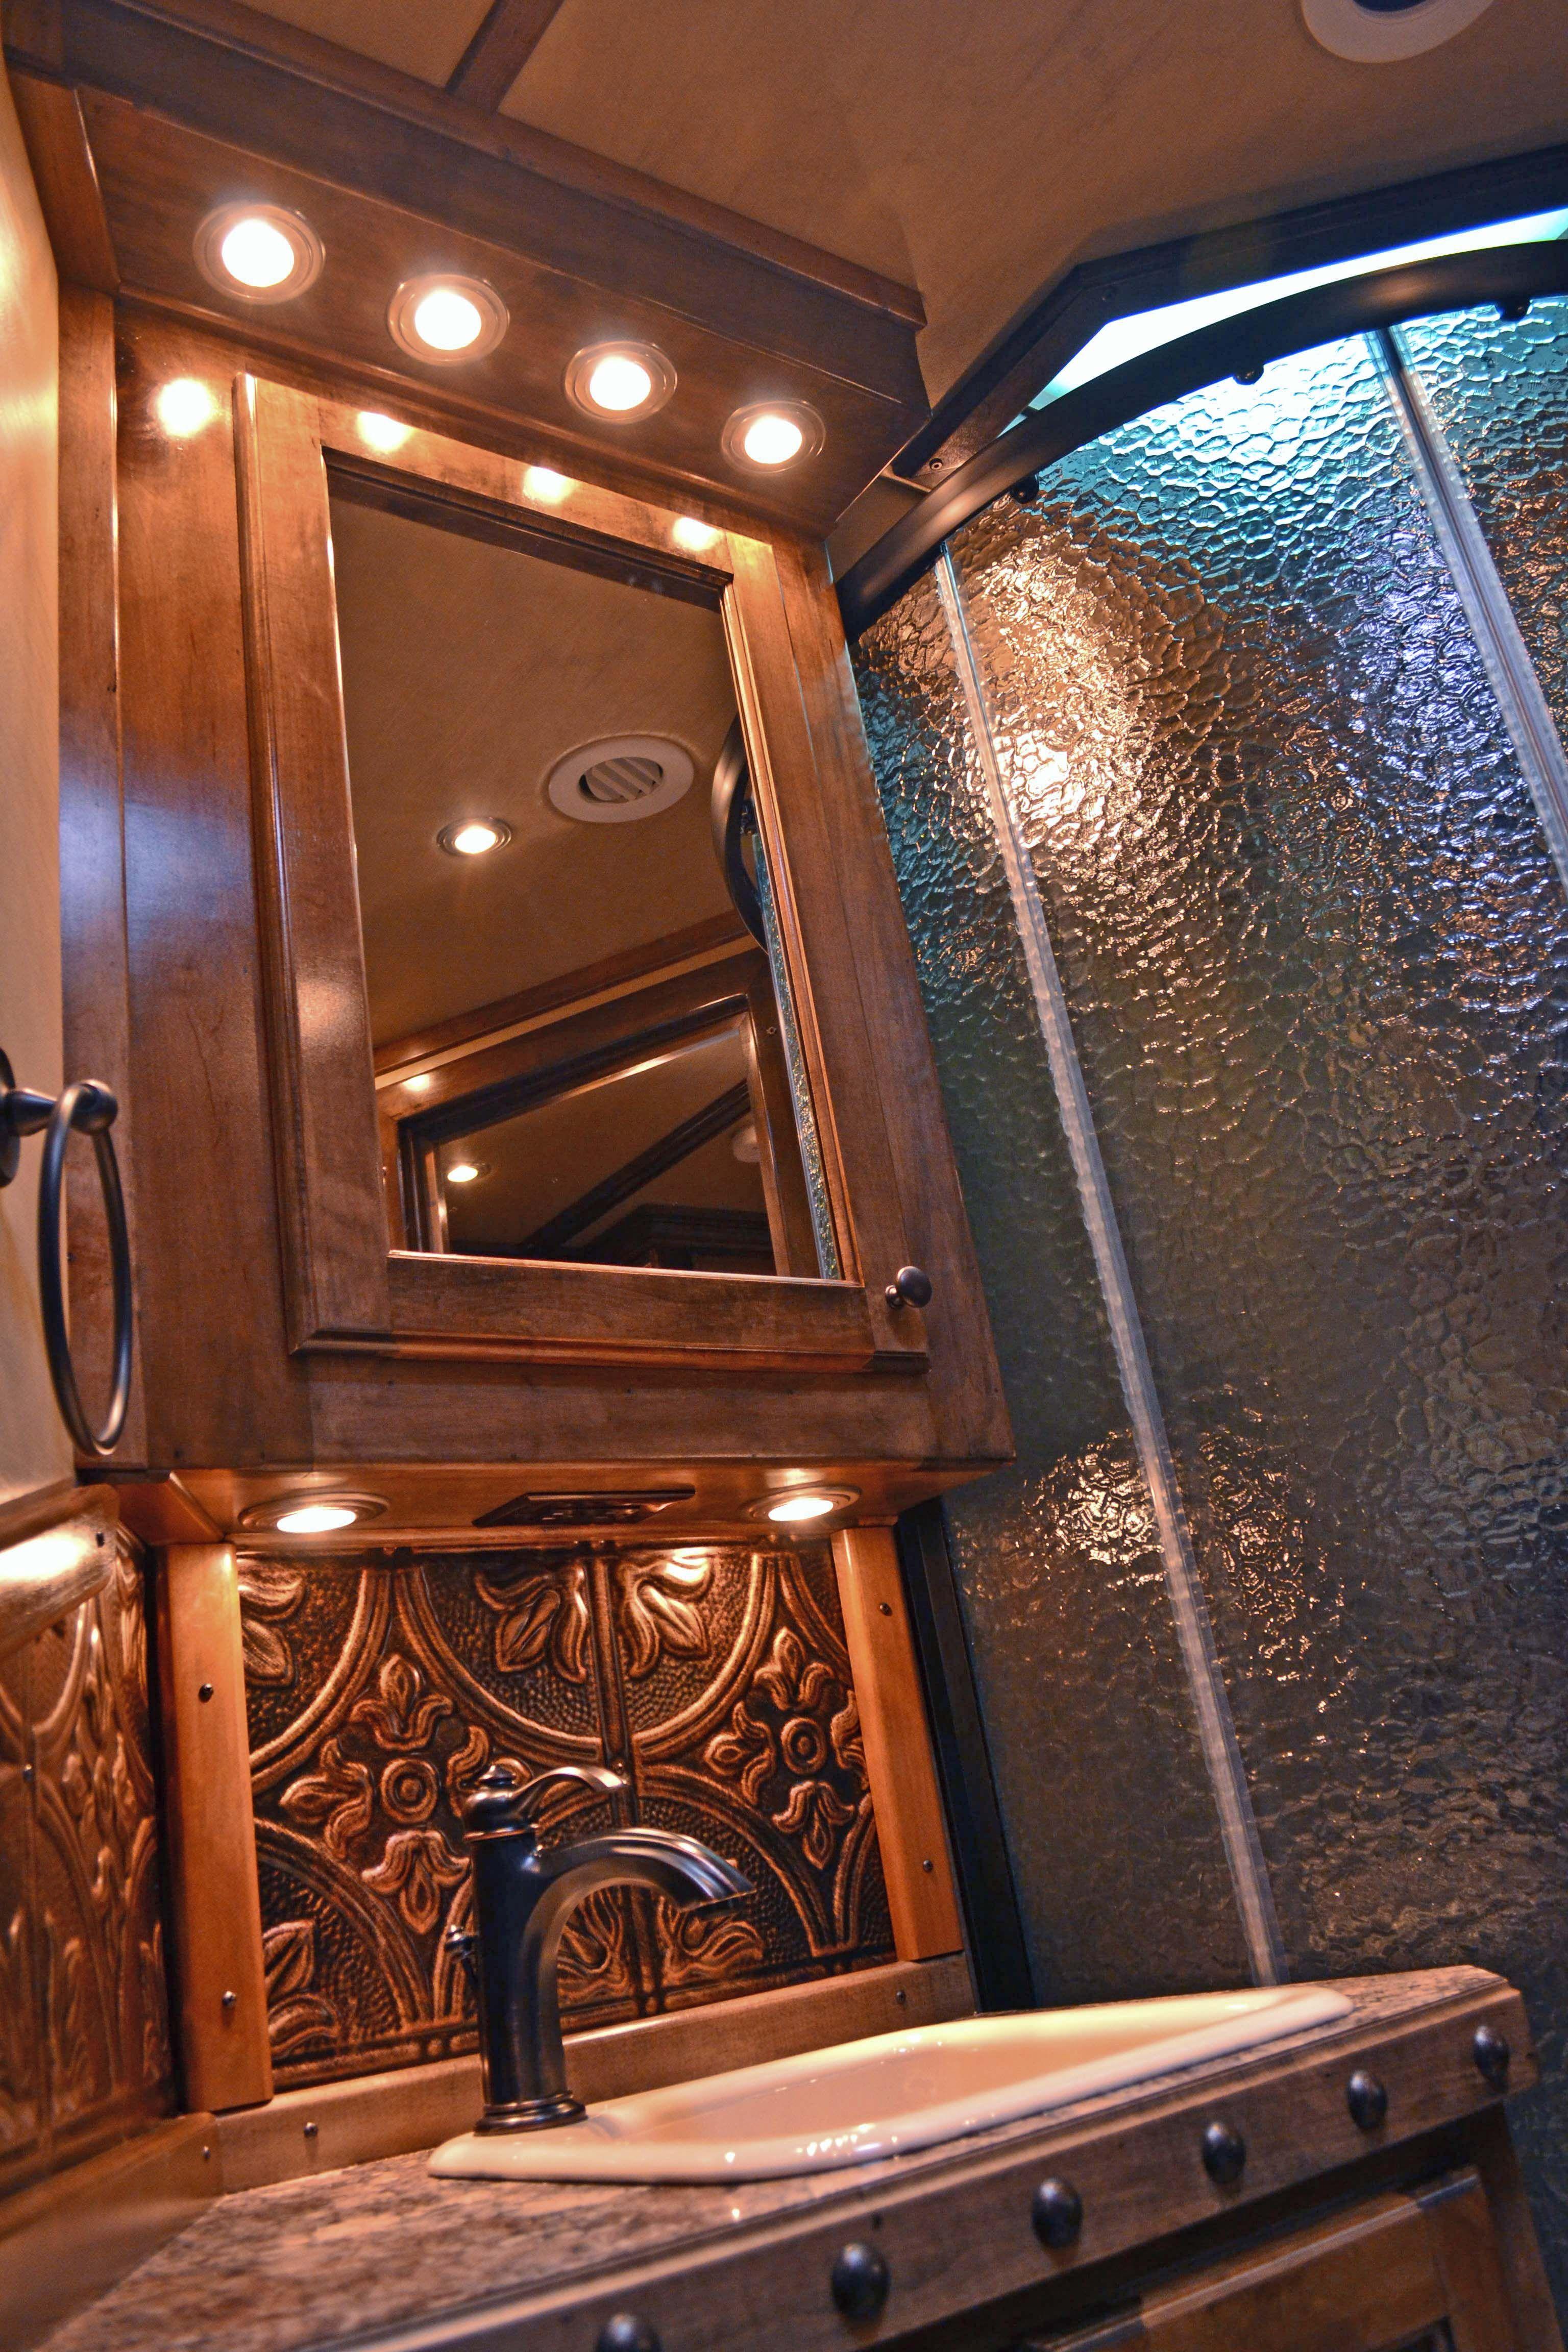 Outlaw conversions custom living quarters horse trailer interiors outlaw conversions custom living quarters horse trailer interiors stamped tin backsplash bronze facet dailygadgetfo Image collections